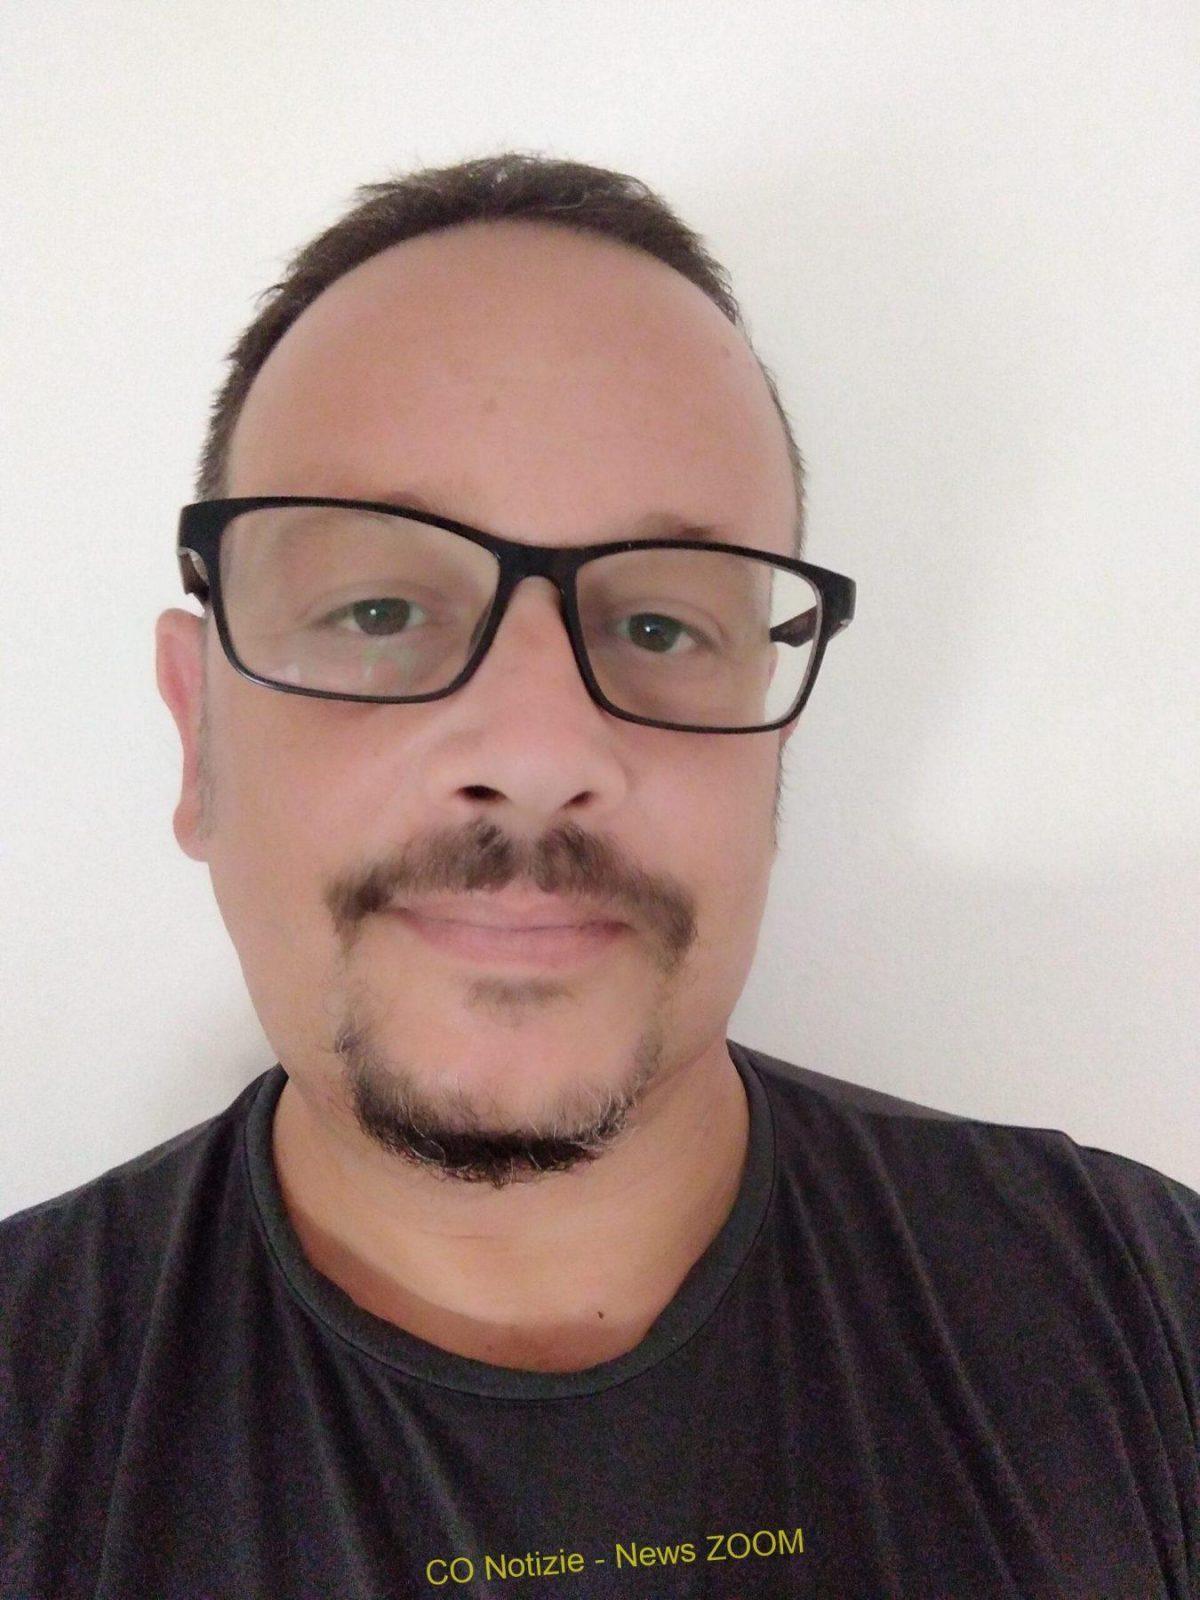 sindaco Politica - 3 domande ai 4 candidati a sindaco per la città di Rho 03/09/2021